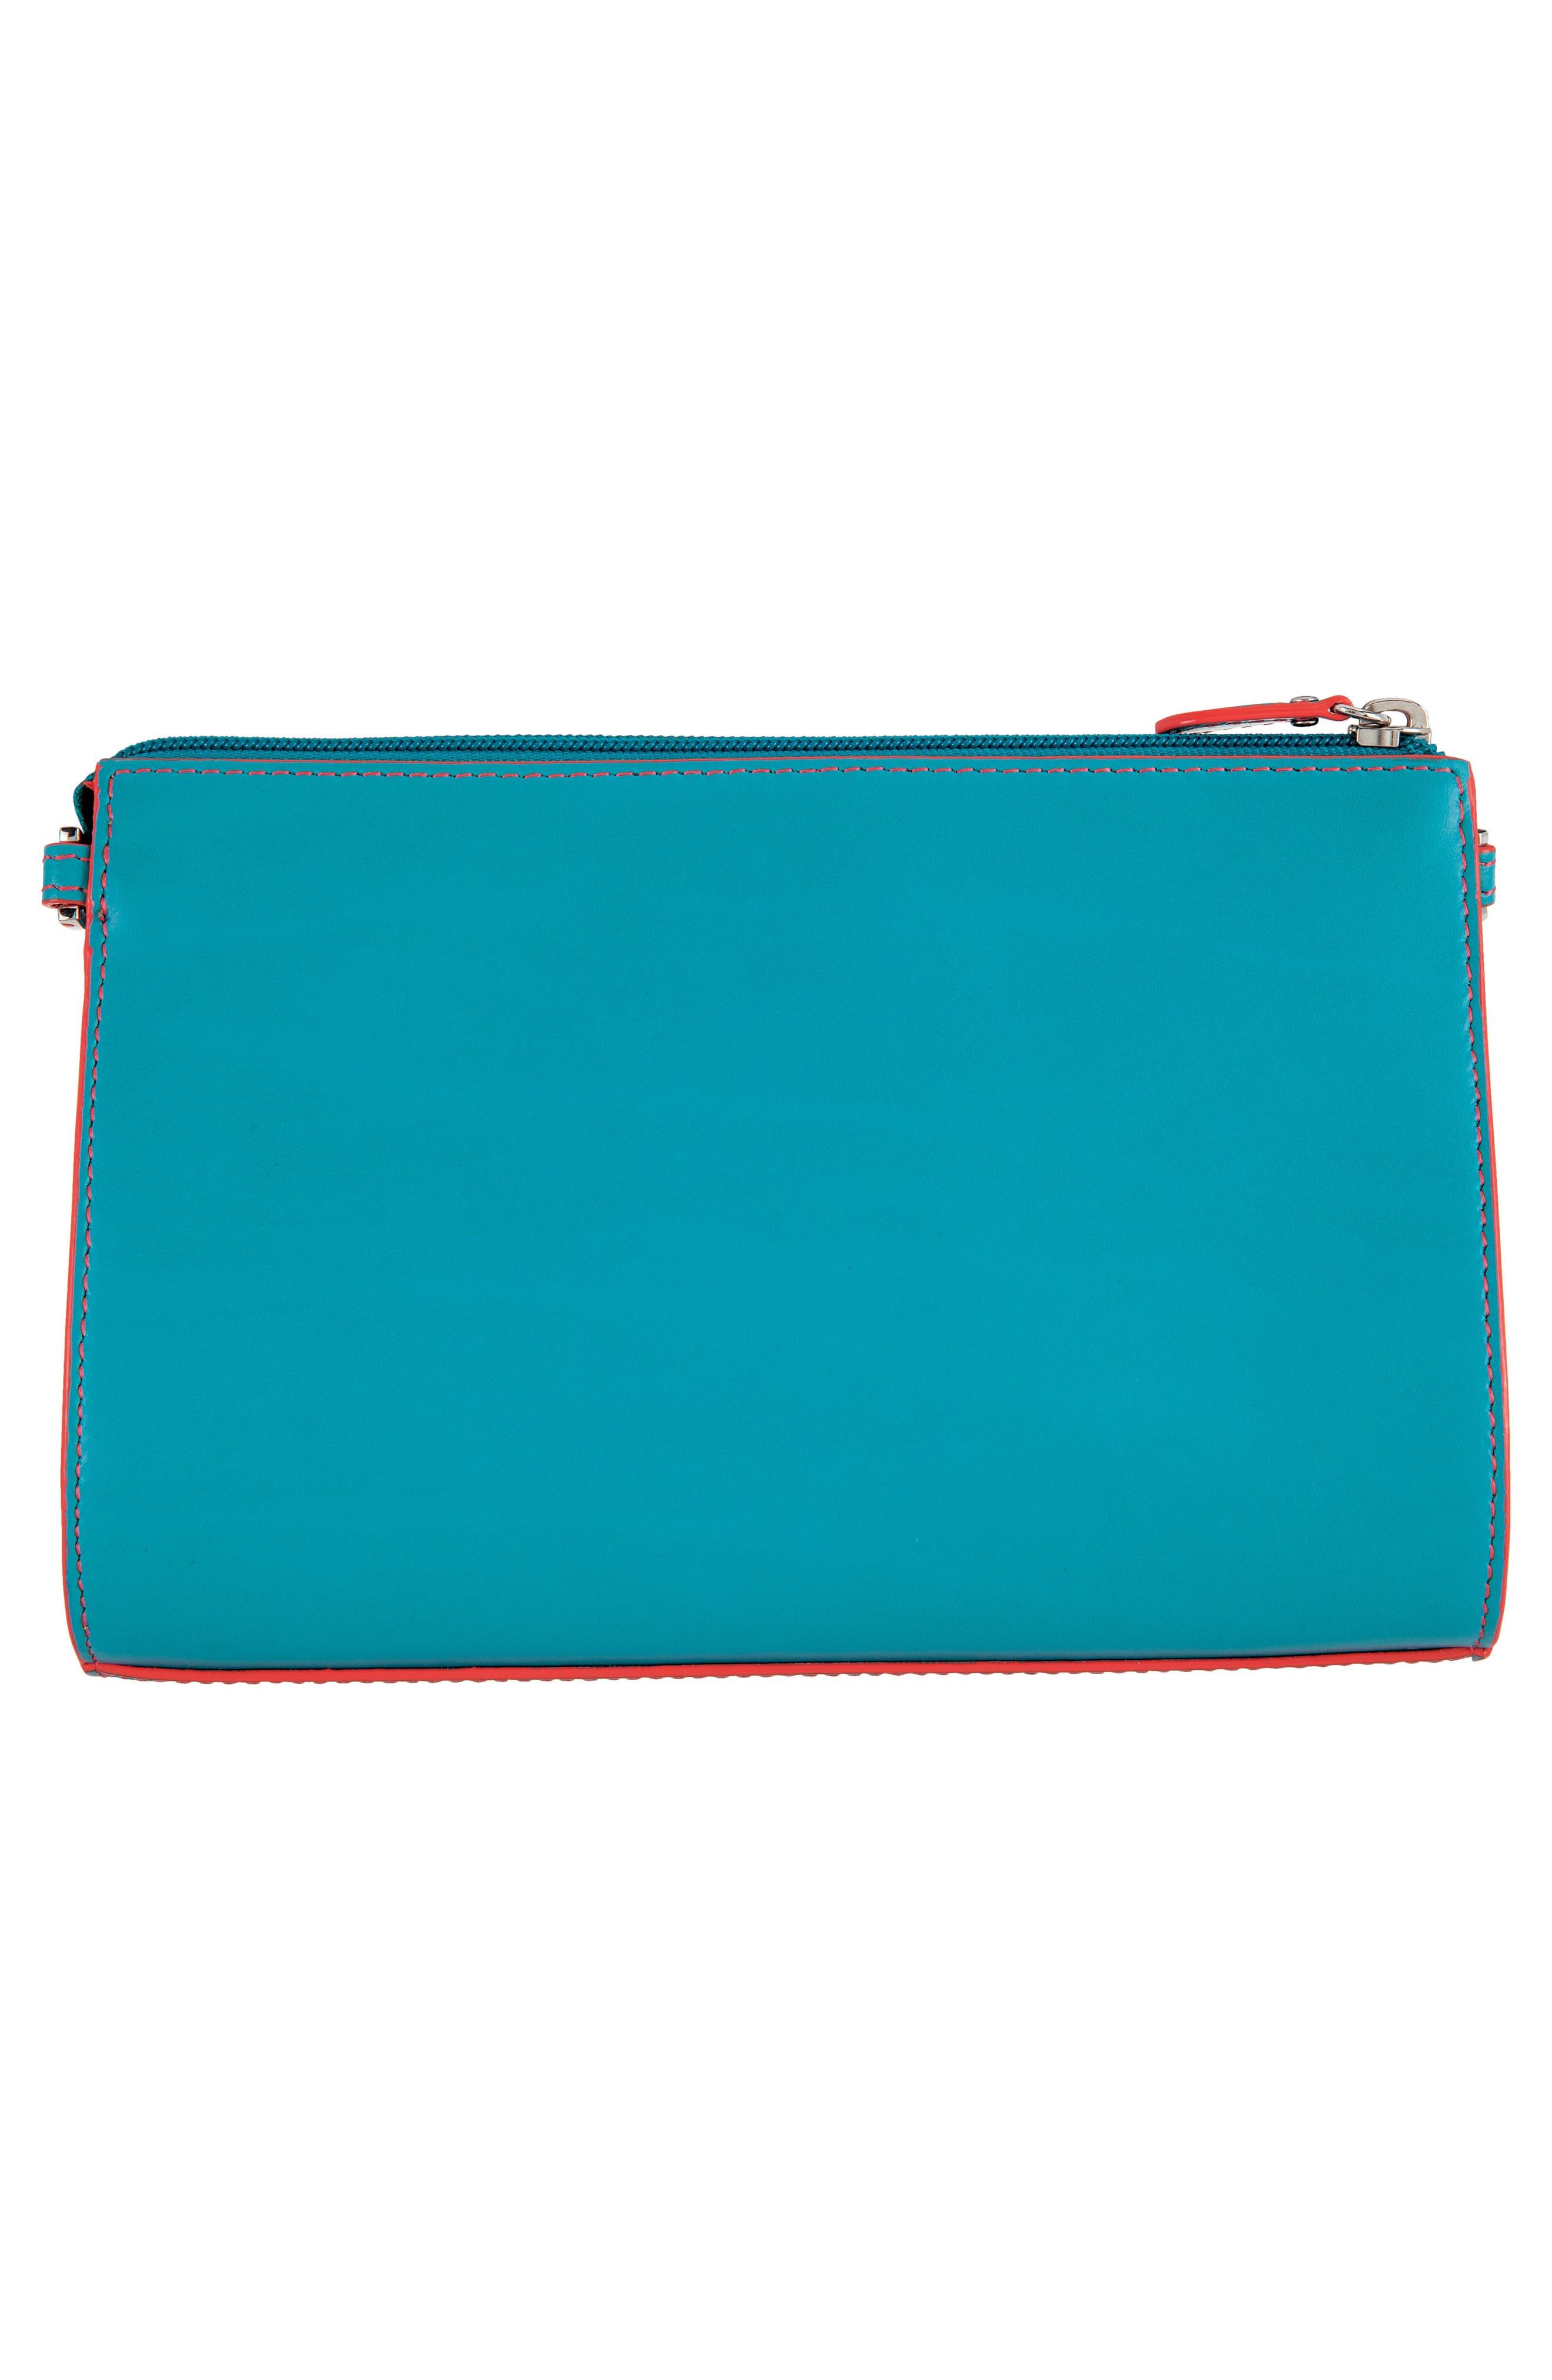 Lodis'Audrey Collection -Vicky' ConvertibleCrossbody Bag,                             Alternate thumbnail 11, color,